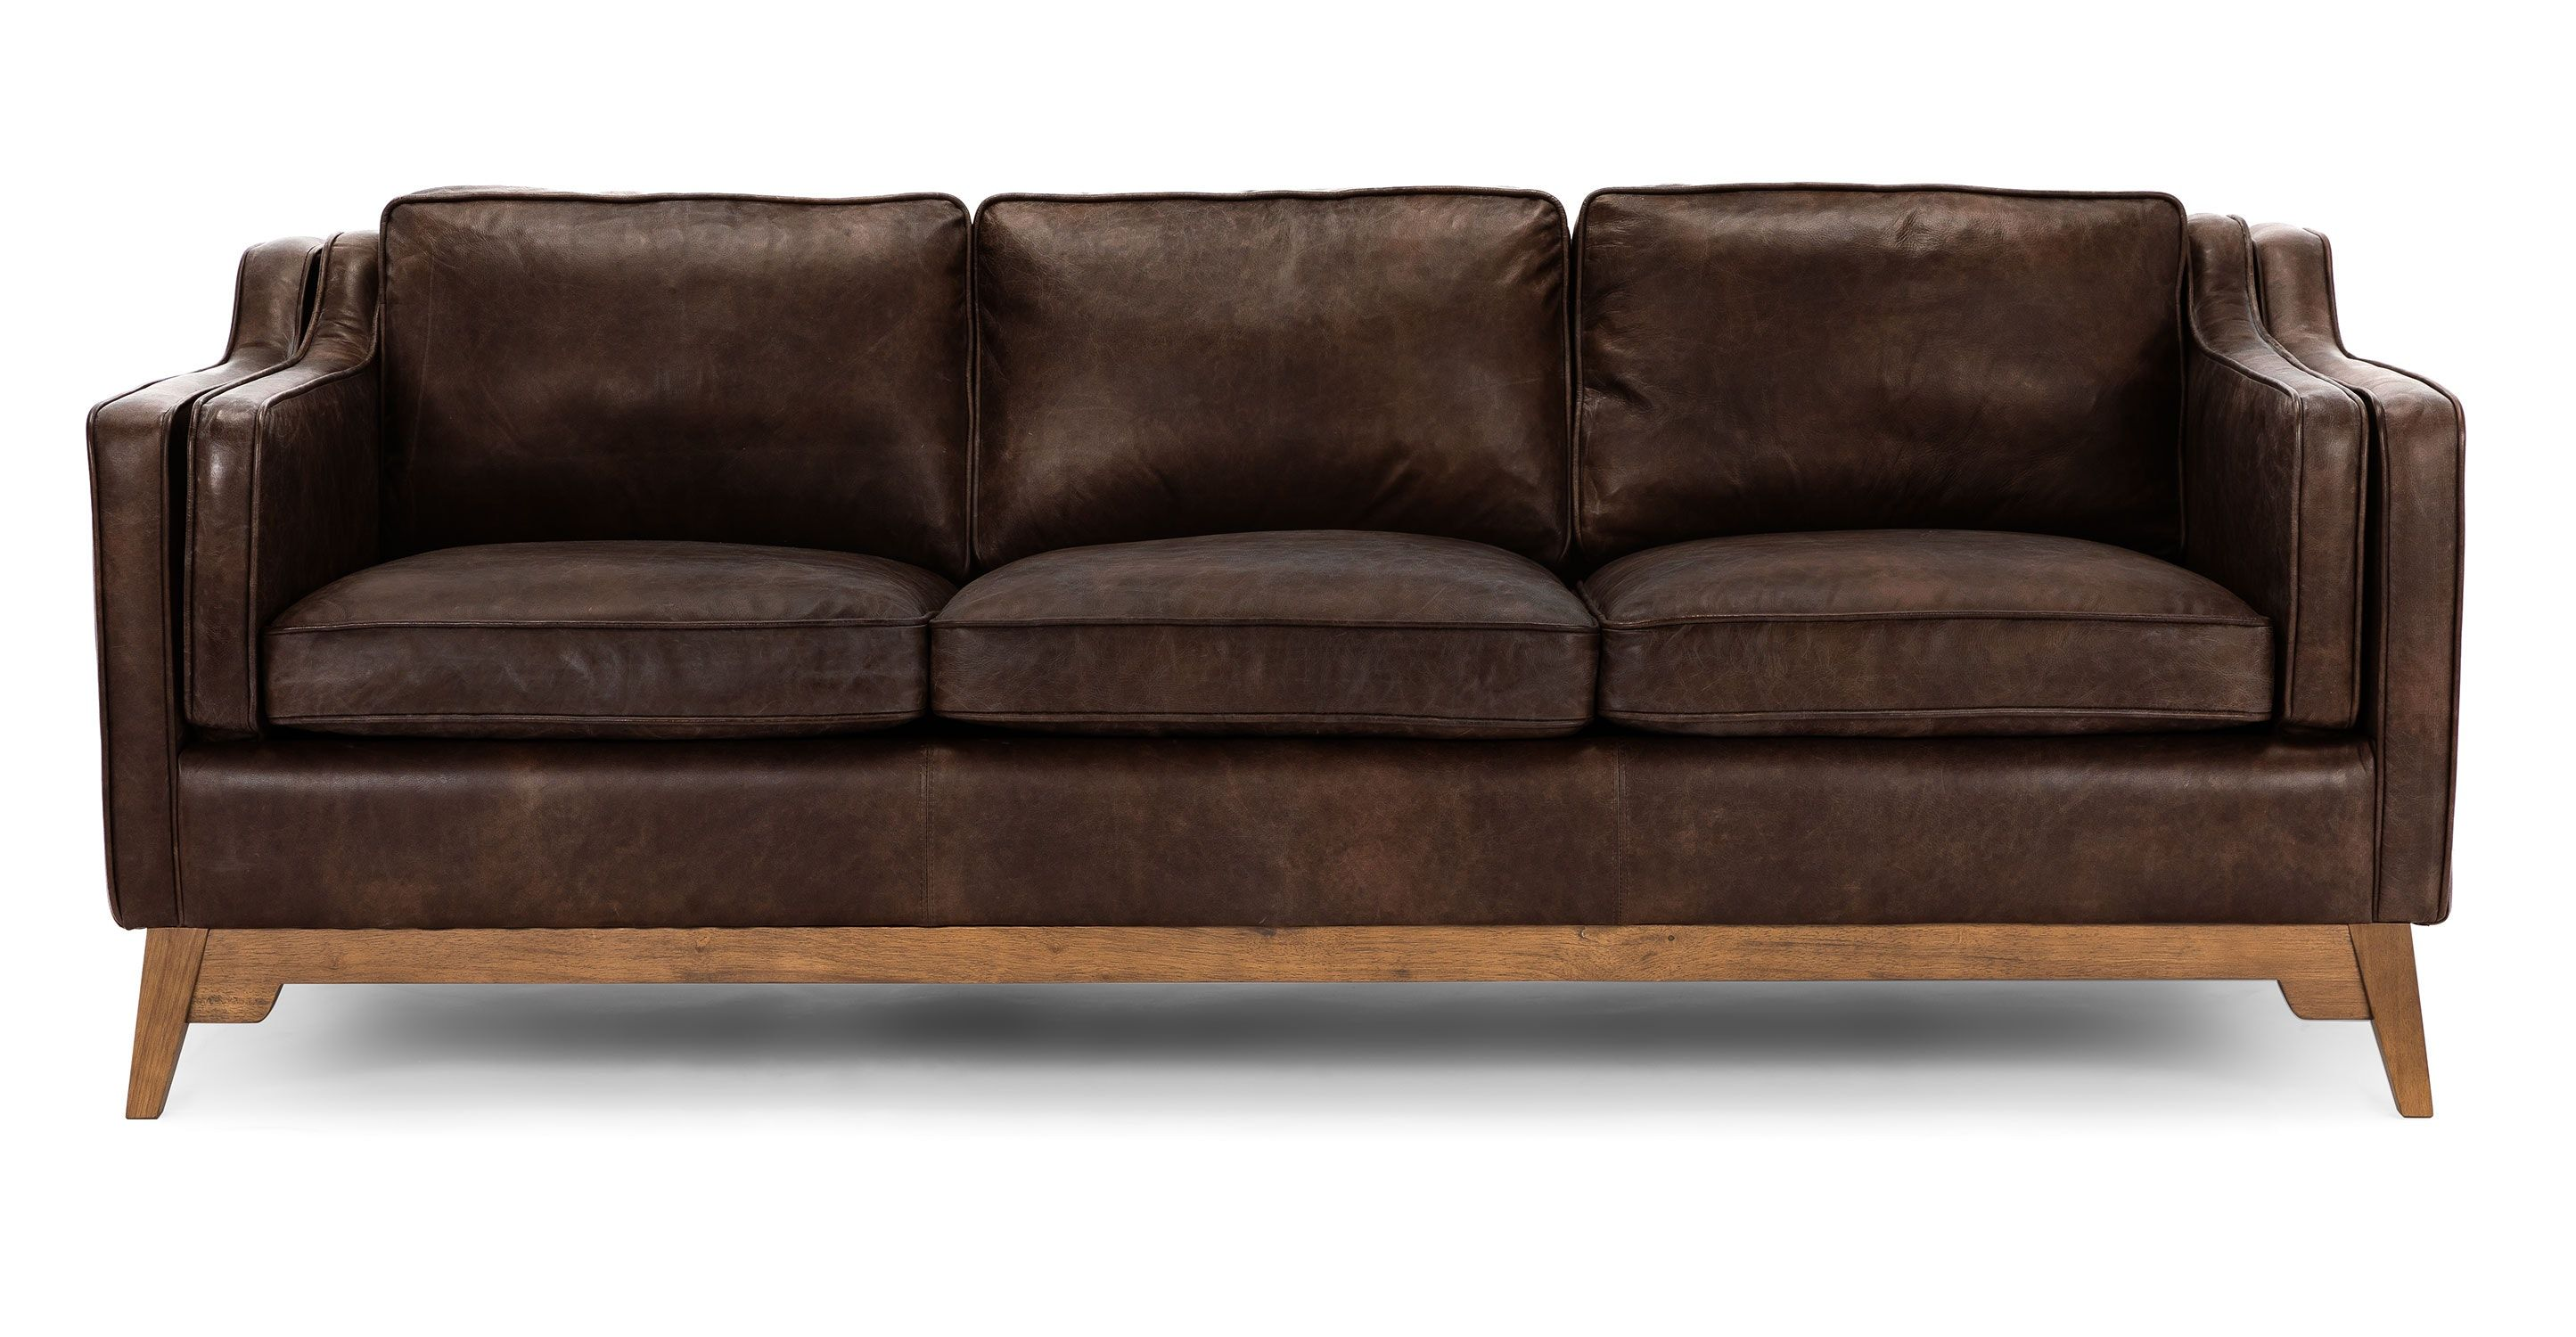 Worthington Oxford Brown Sofa Black Sofa Brown Living Room Decor Black Leather Sofas